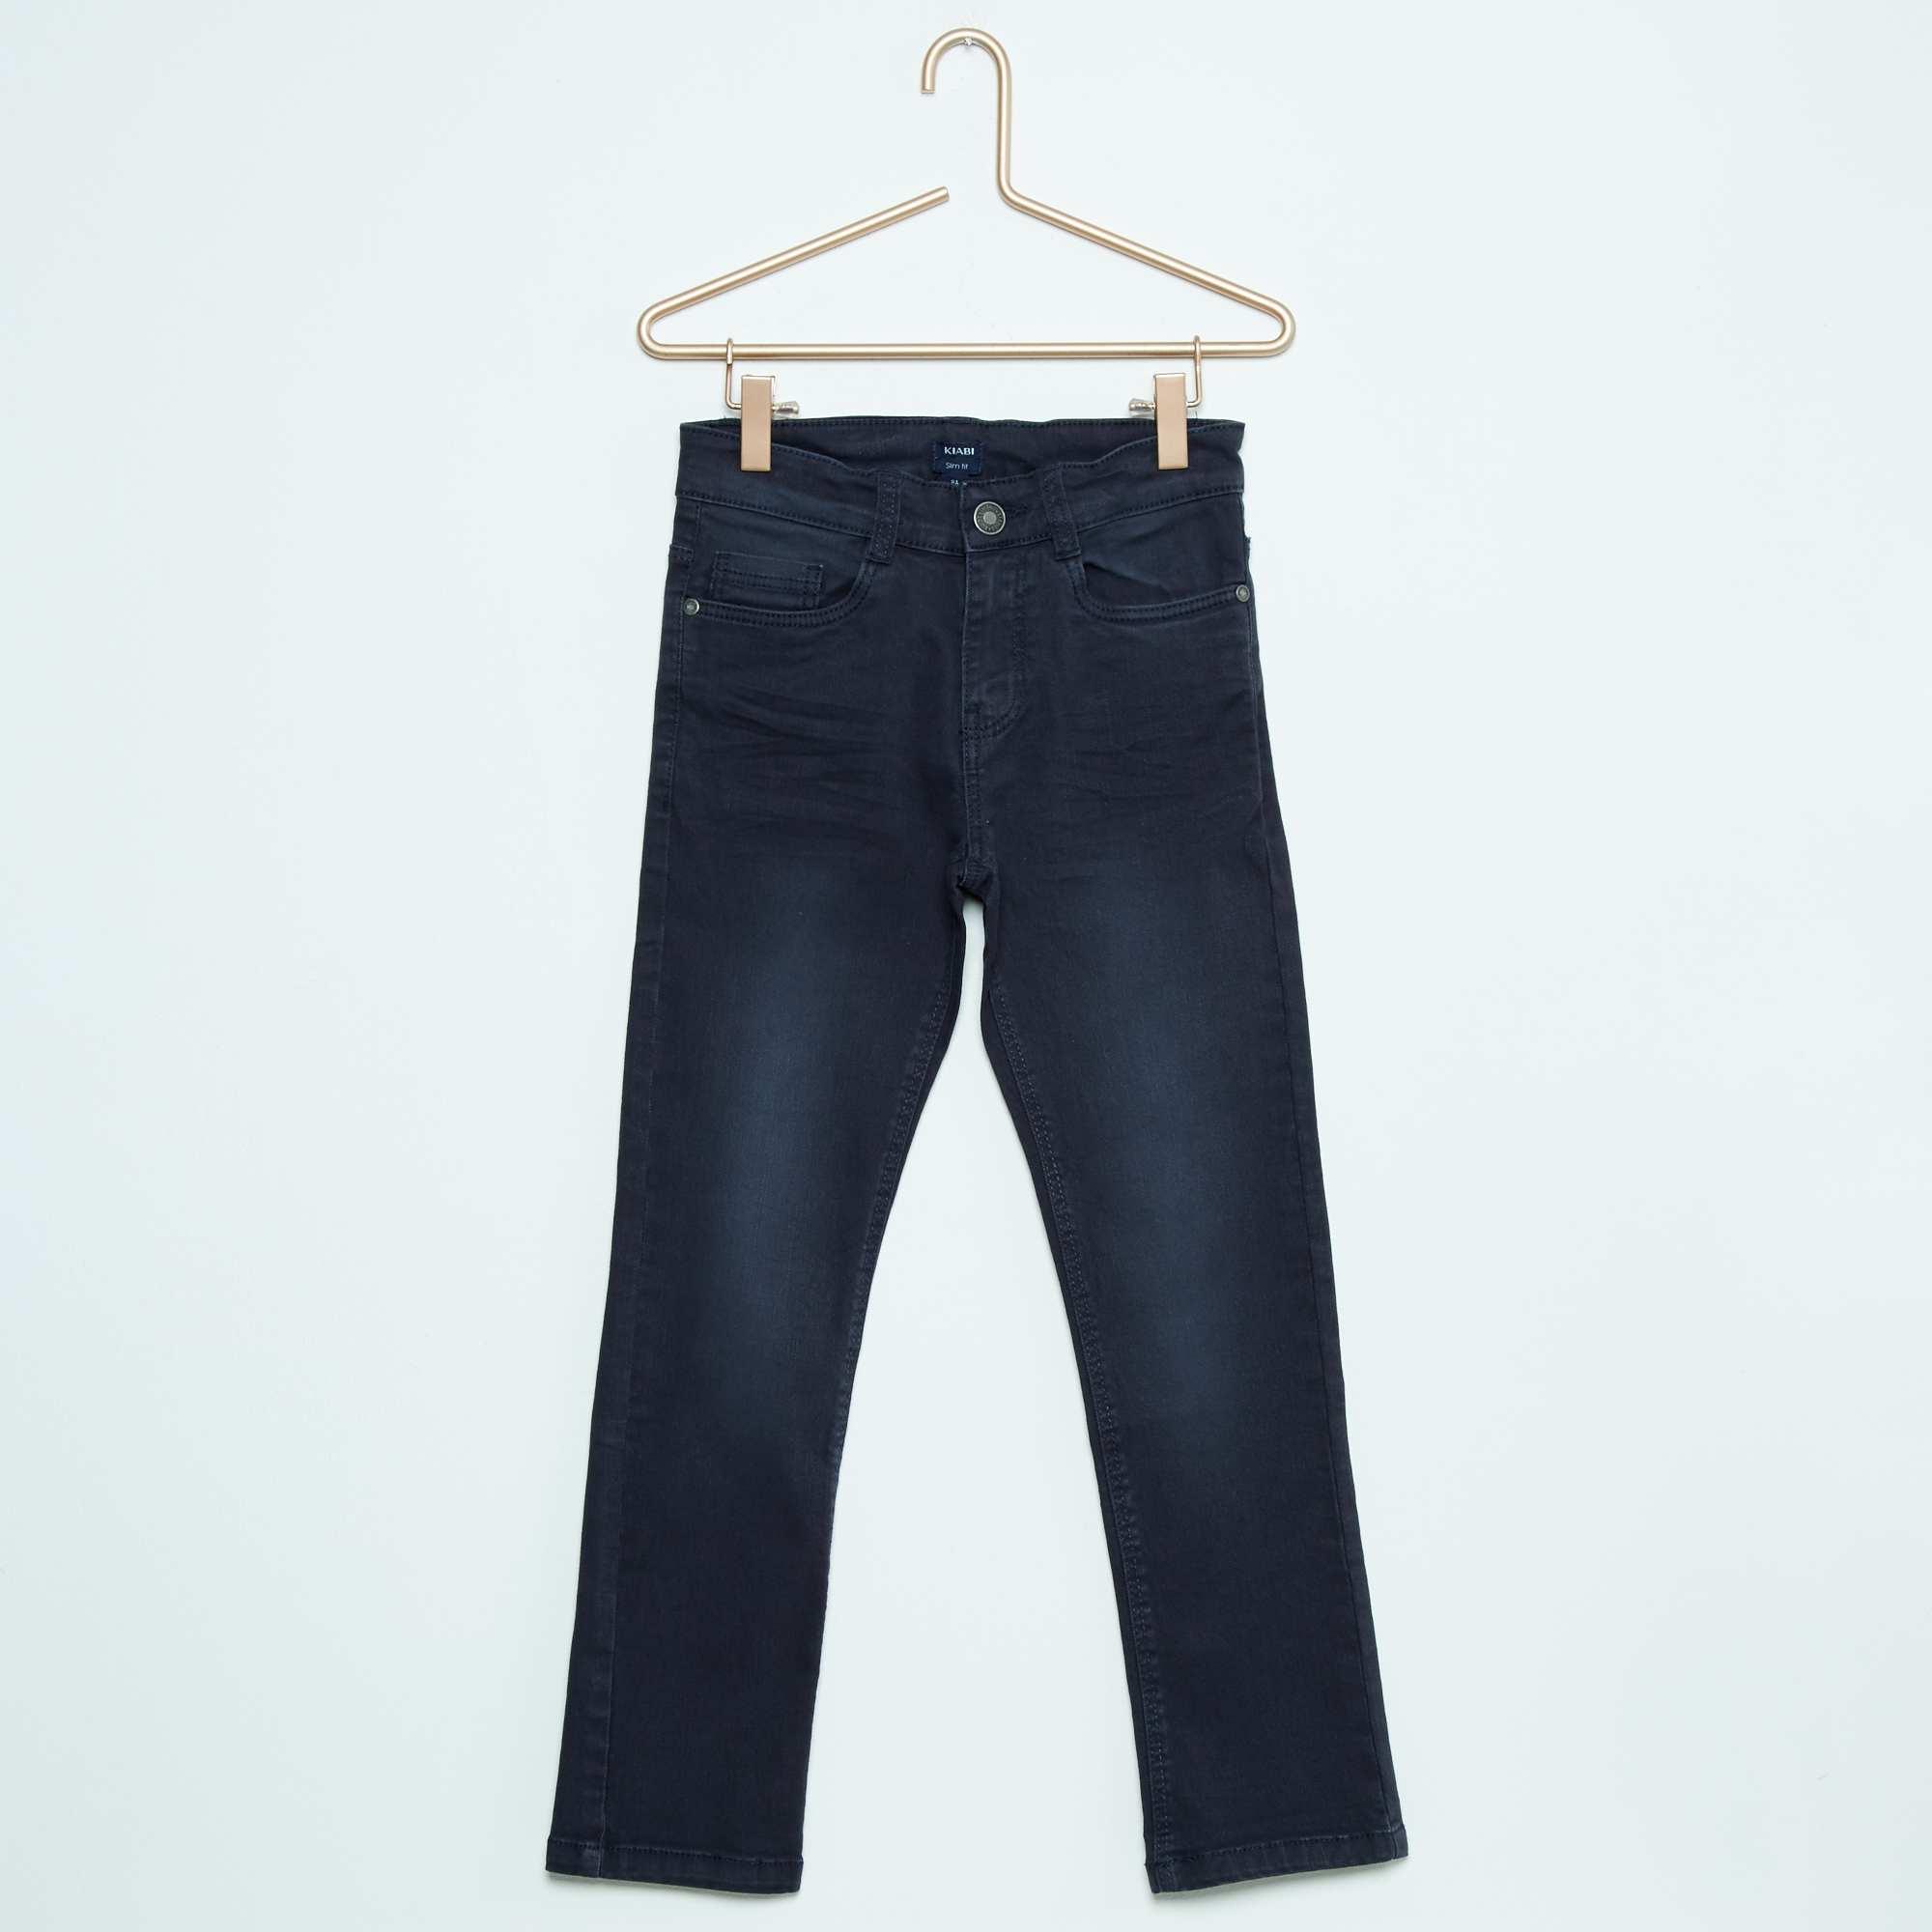 pantalon slim gar on bleu marine kiabi 13 00. Black Bedroom Furniture Sets. Home Design Ideas